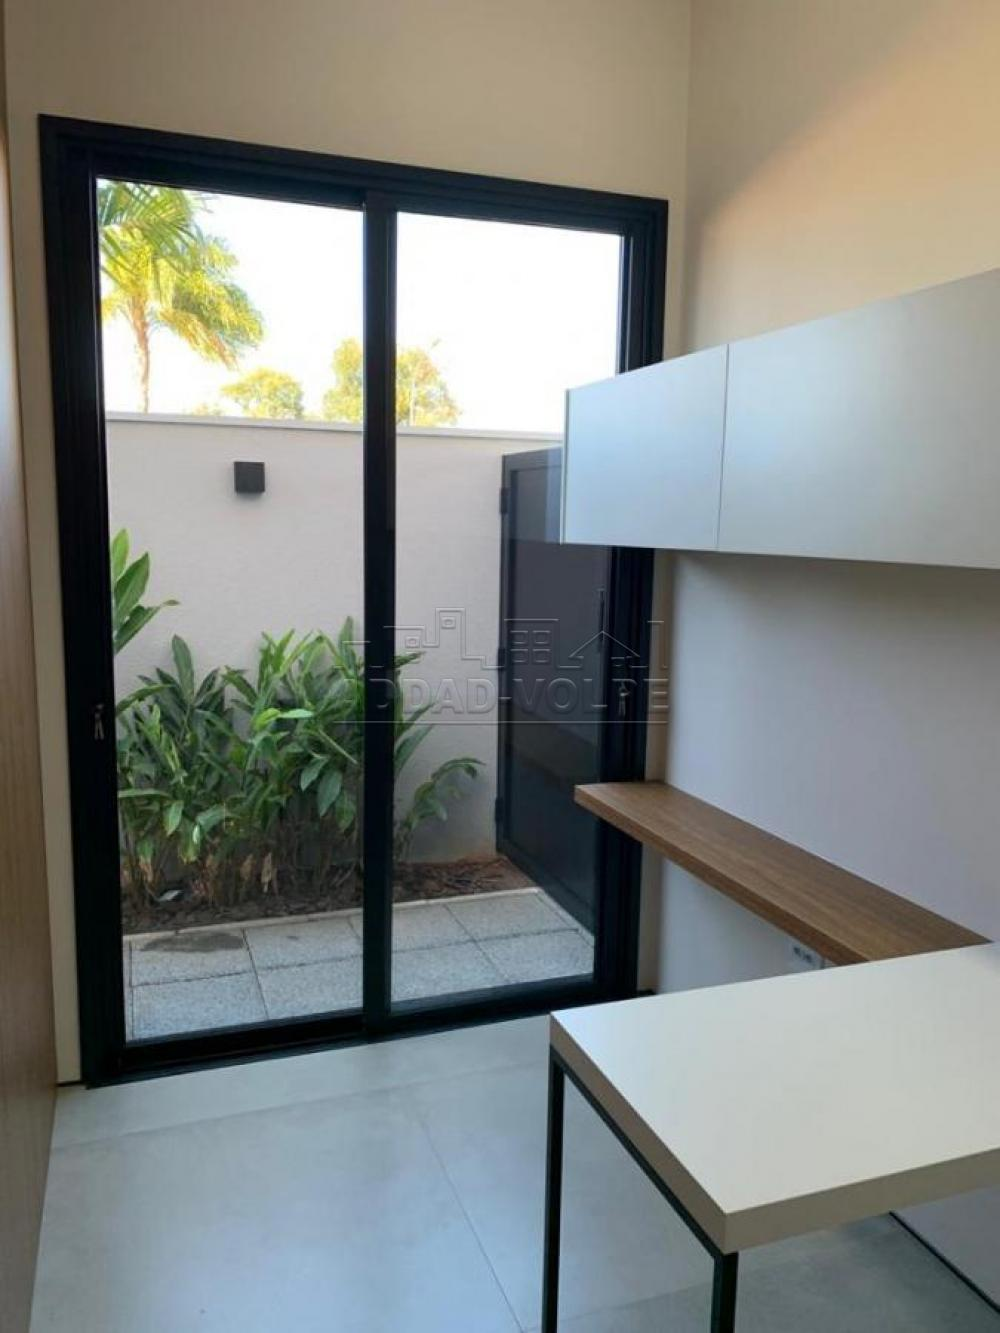 Comprar Casa / Condomínio em Bauru R$ 2.000.000,00 - Foto 11